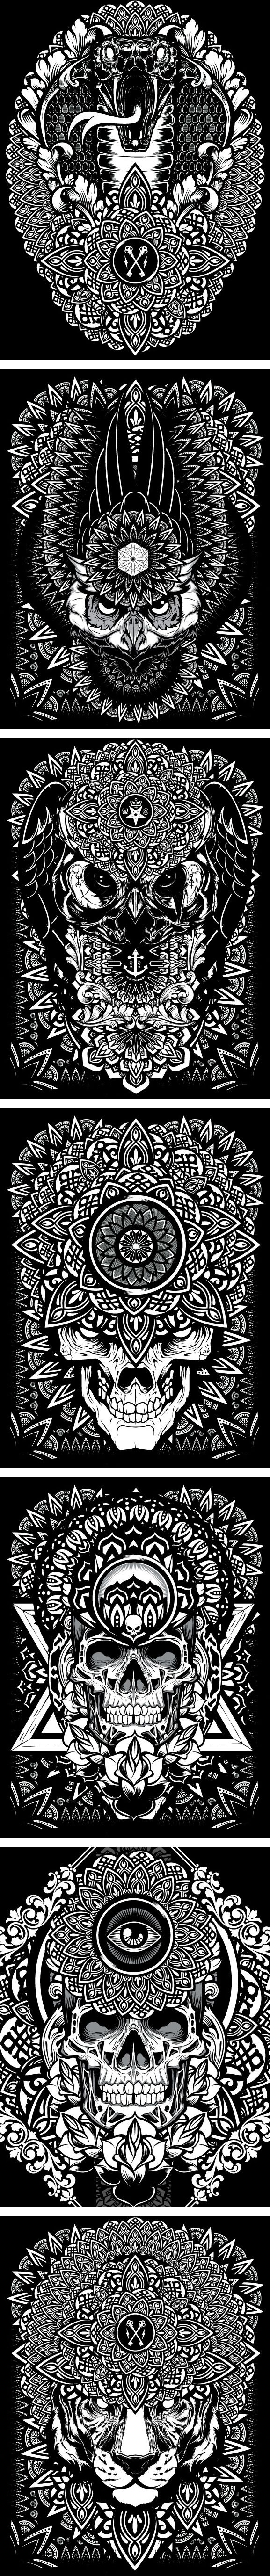 Mandala Exploration by Joshua M. Smith, via Behance